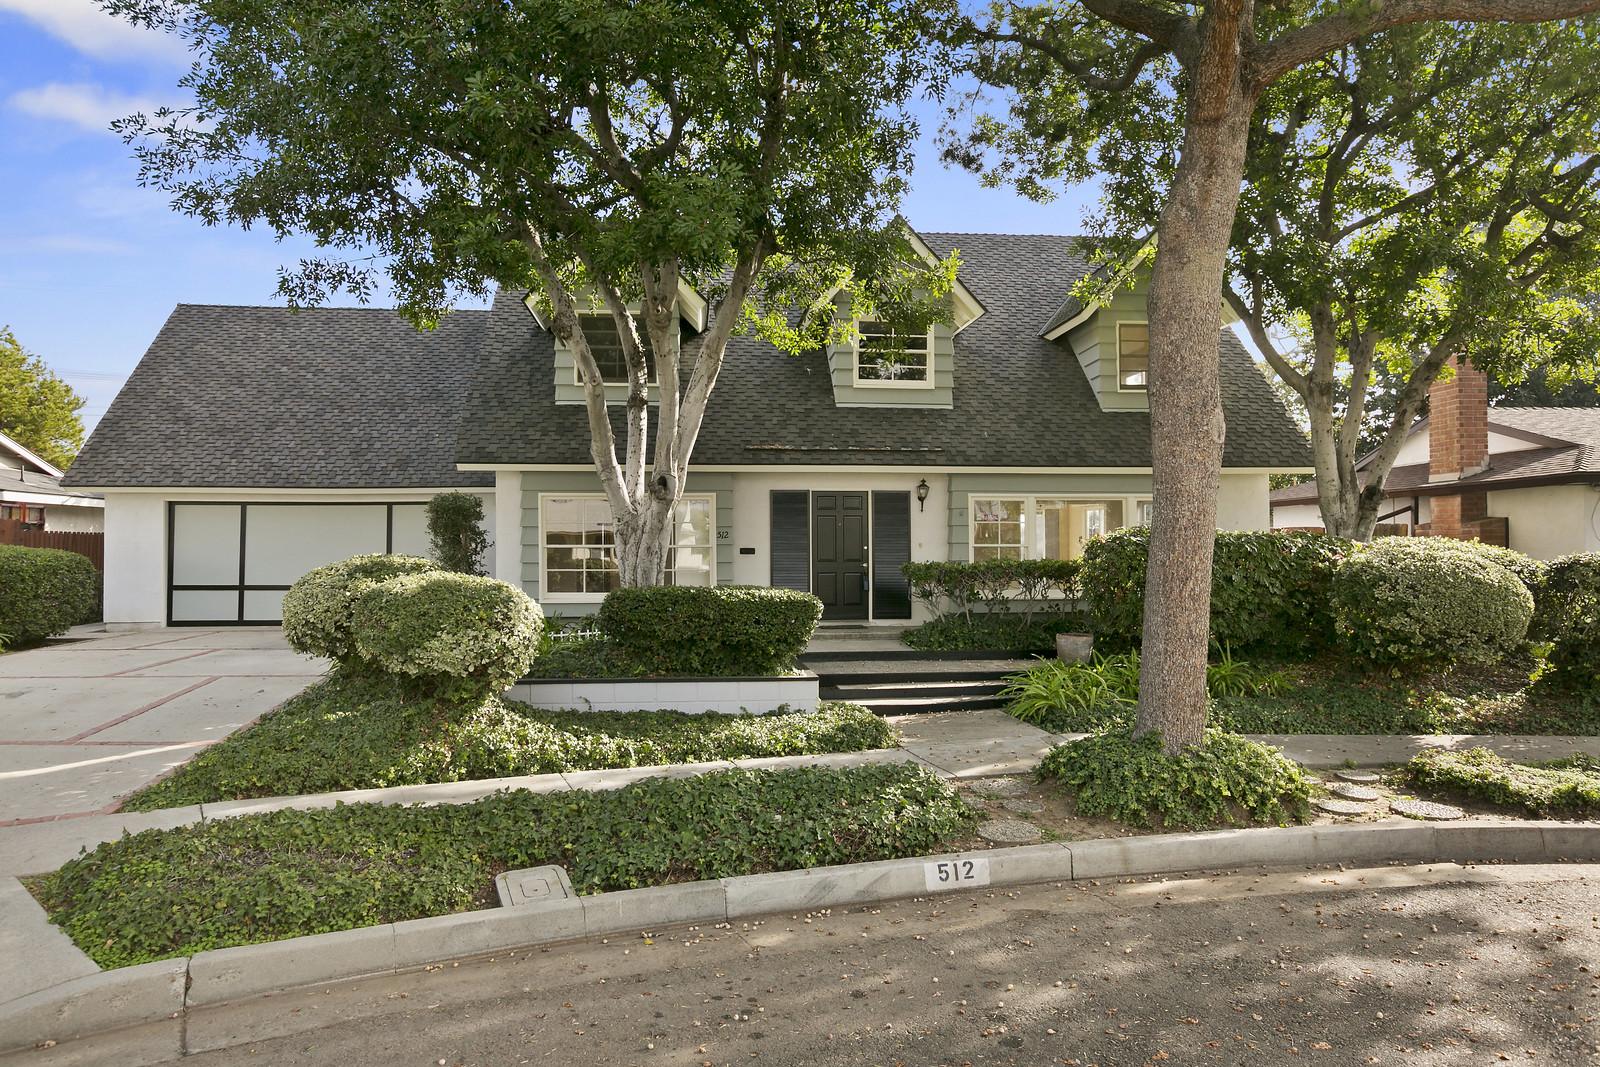 512 Stanford Avenue